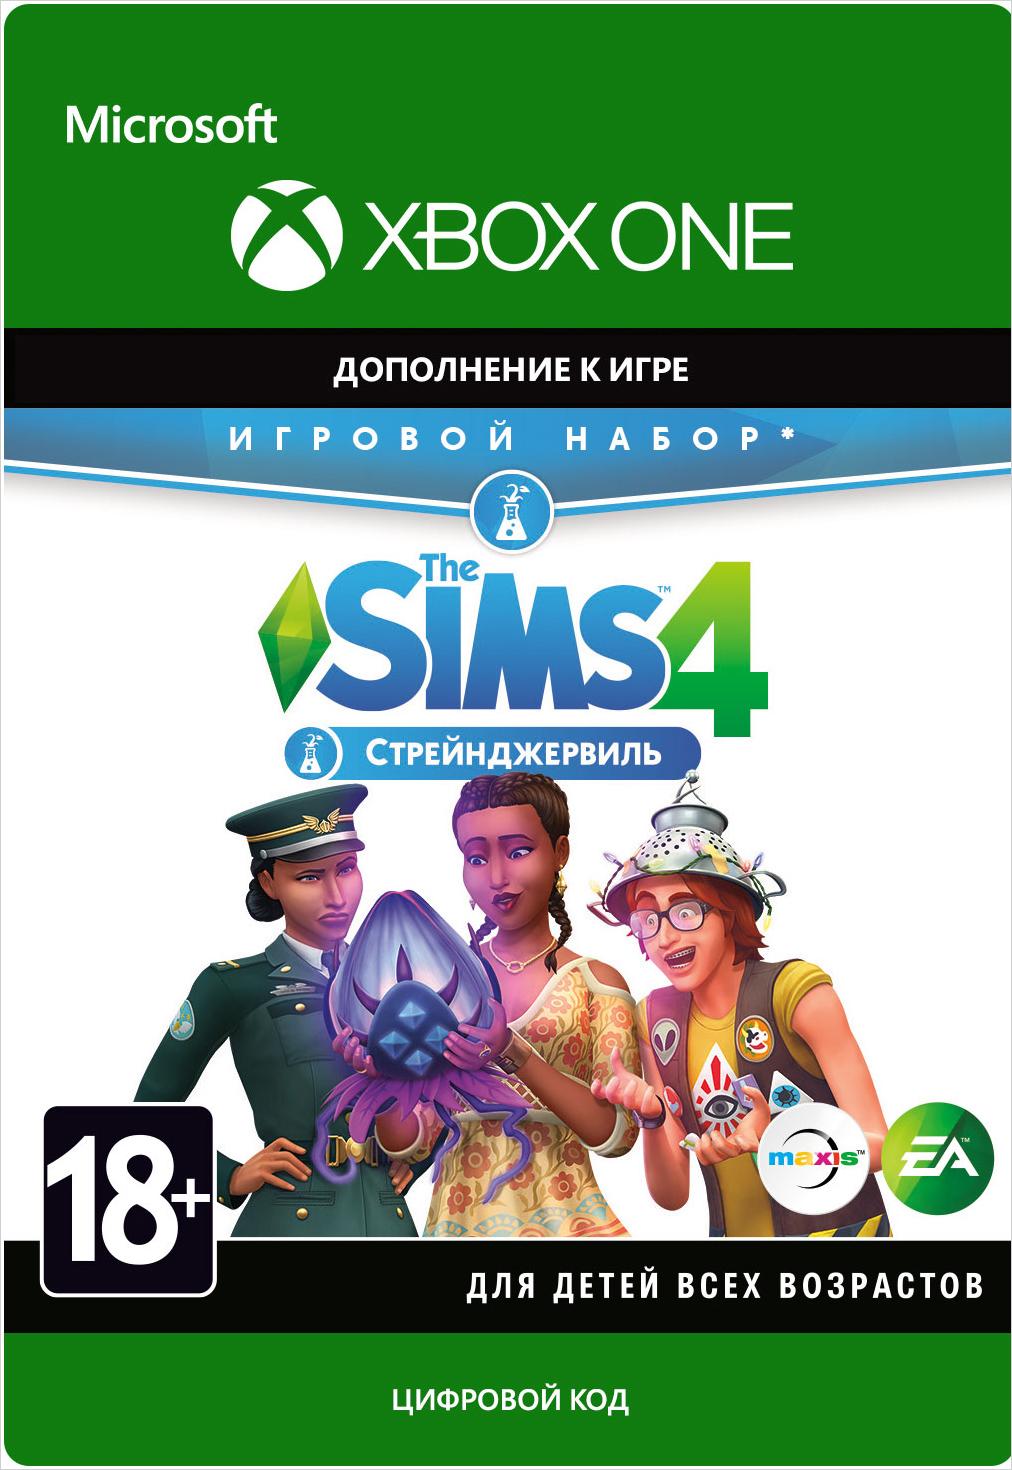 Фото - The Sims 4: Strangerville. Дополнение [Xbox One, Цифровая версия] (Цифровая версия) agatha christie the abc murders [pc цифровая версия] цифровая версия